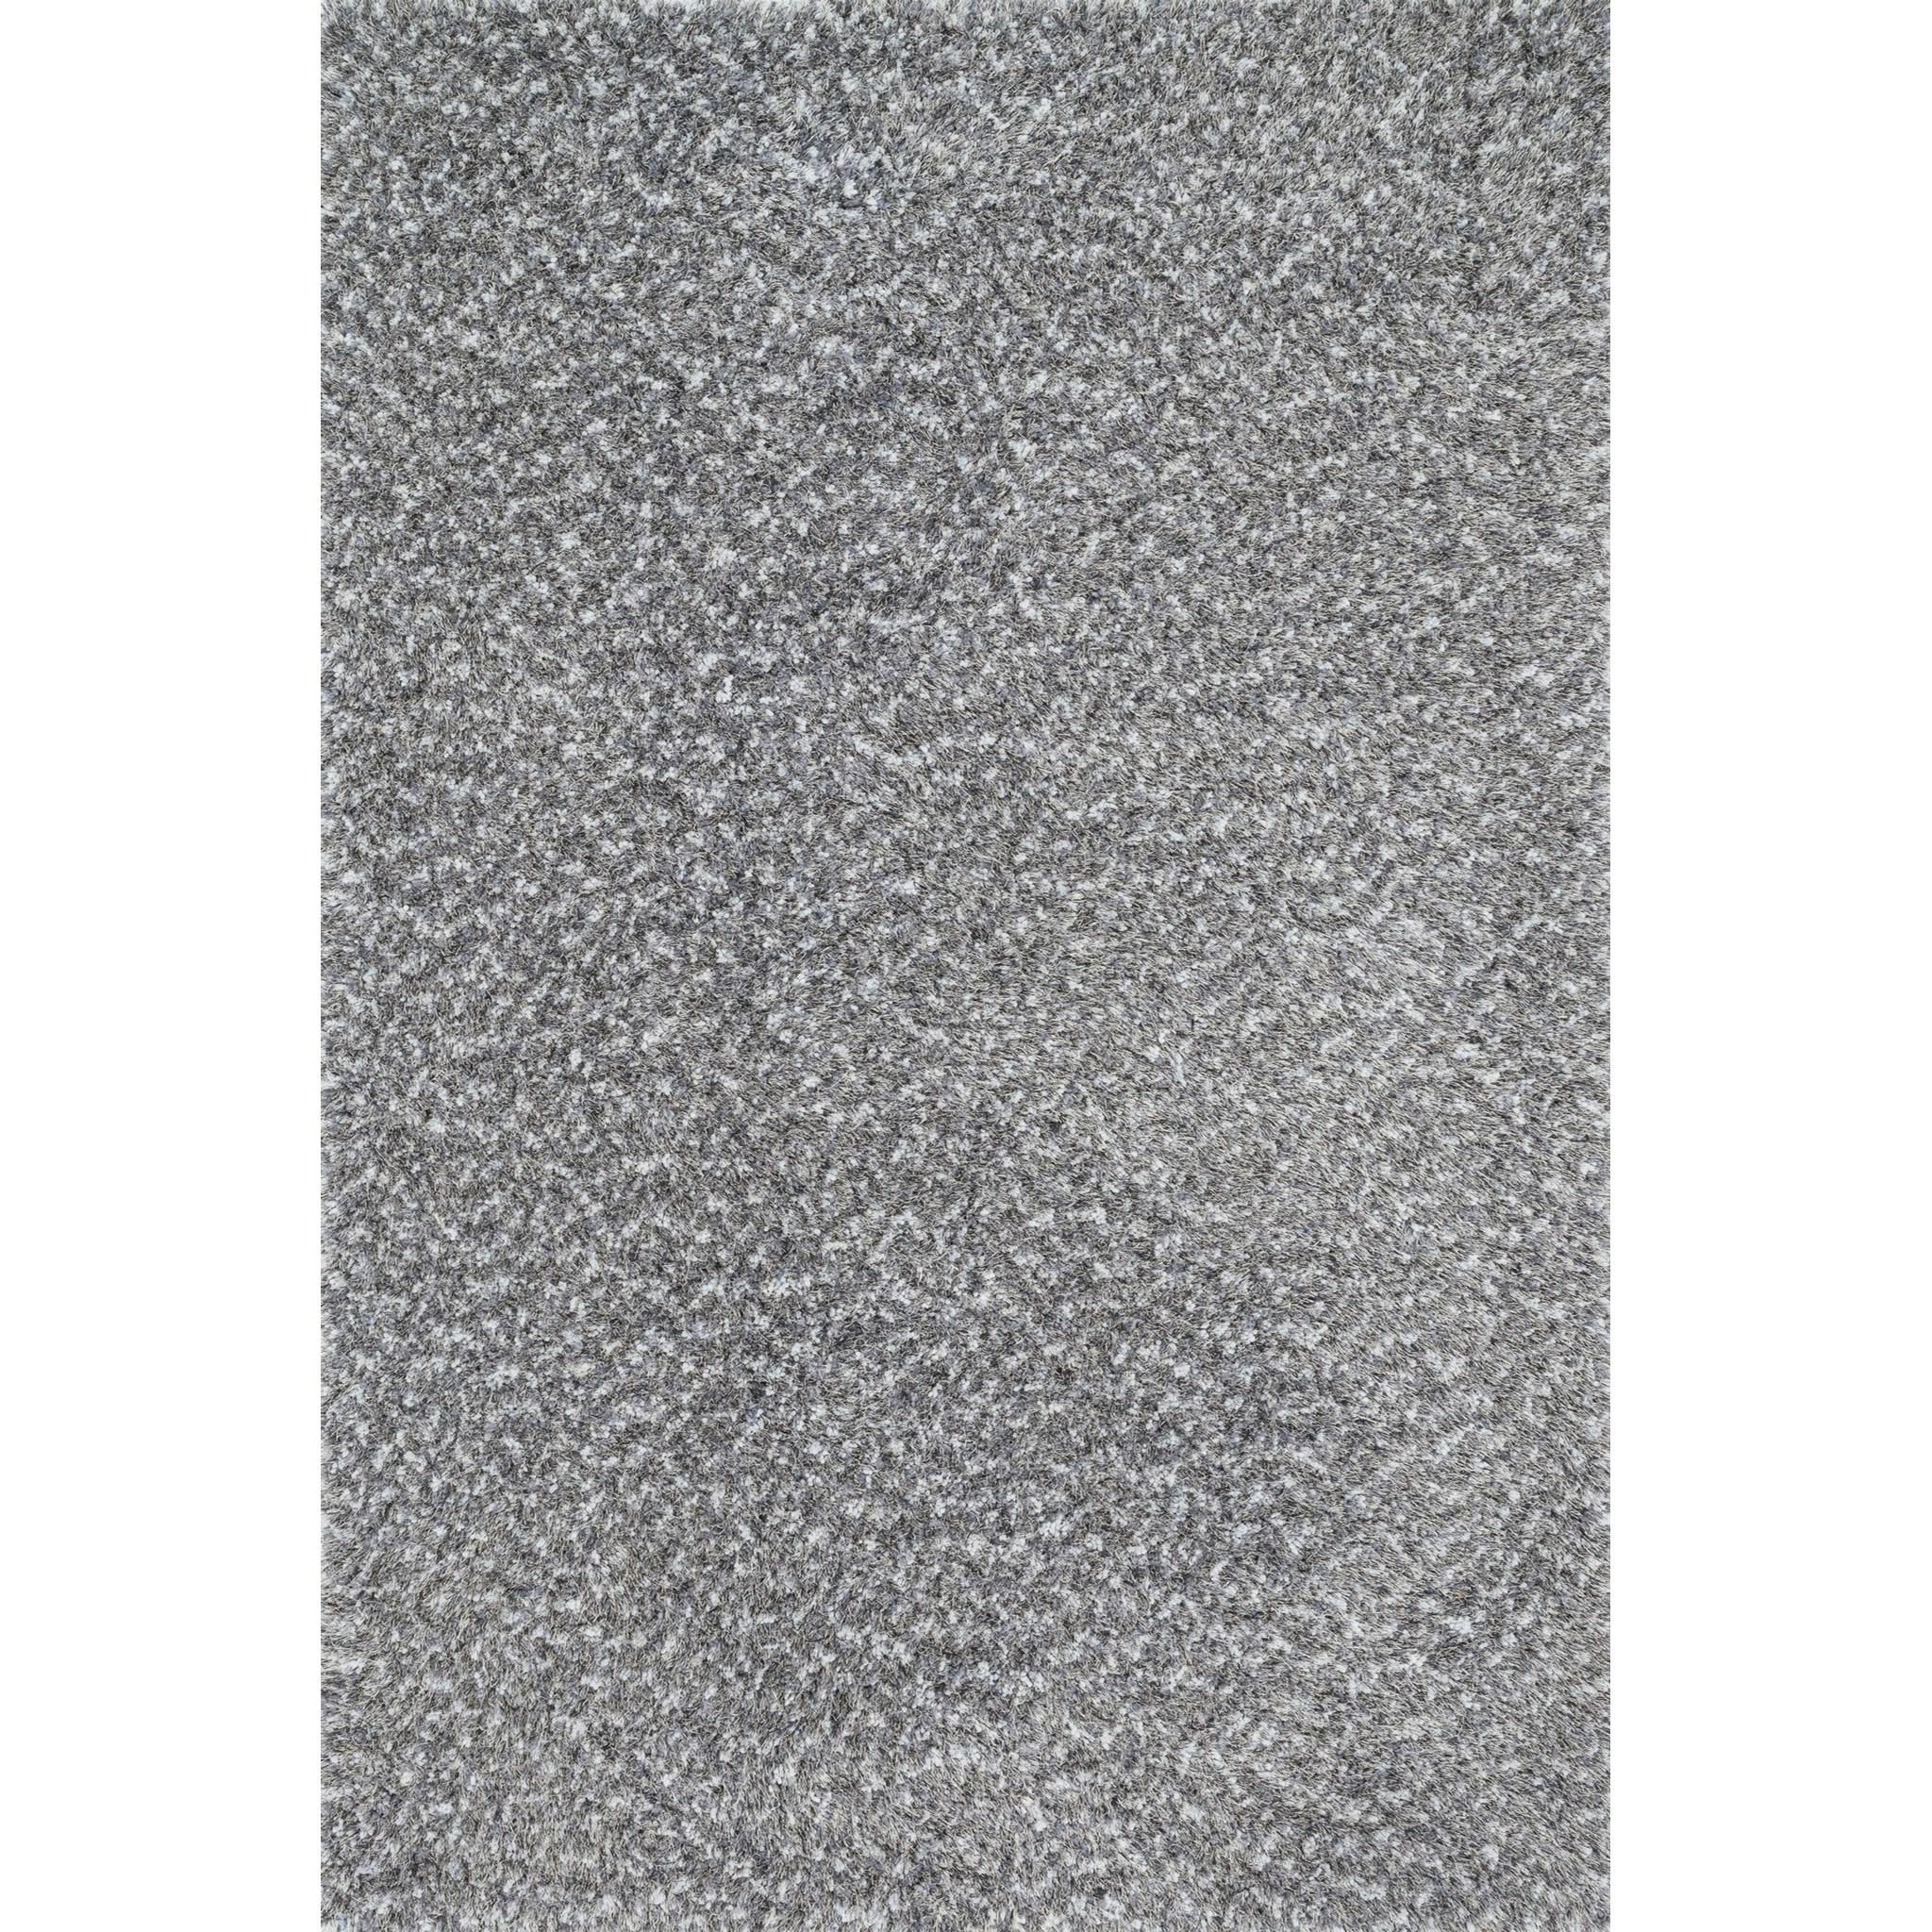 "Callie Shag 7'-6"" x 9'-6"" Area Rug by Loloi Rugs at Virginia Furniture Market"